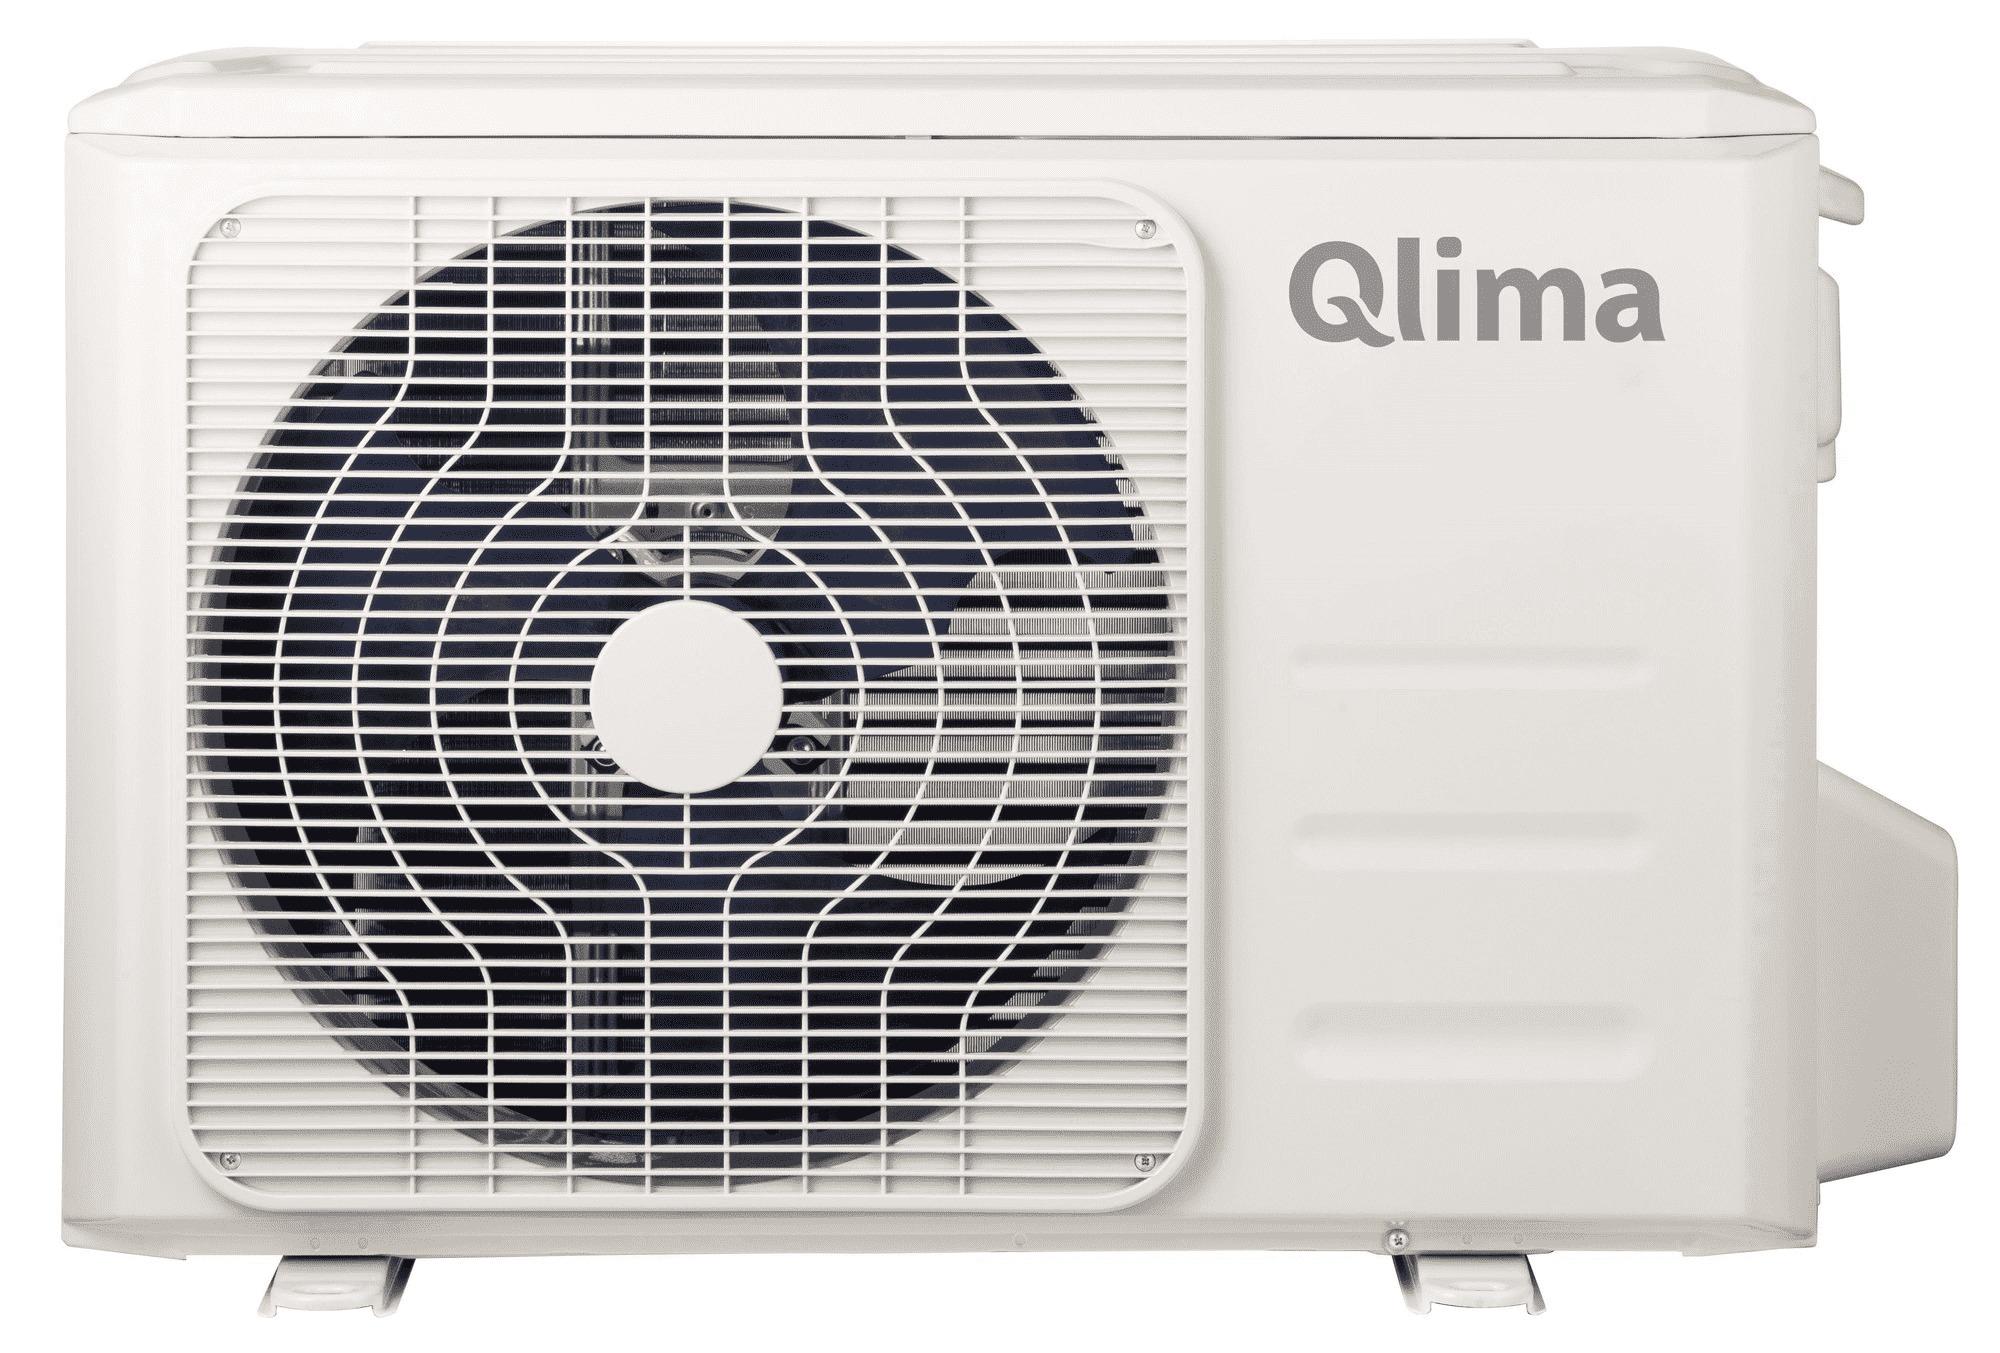 Qlima split unit airco SC 5248 compleet